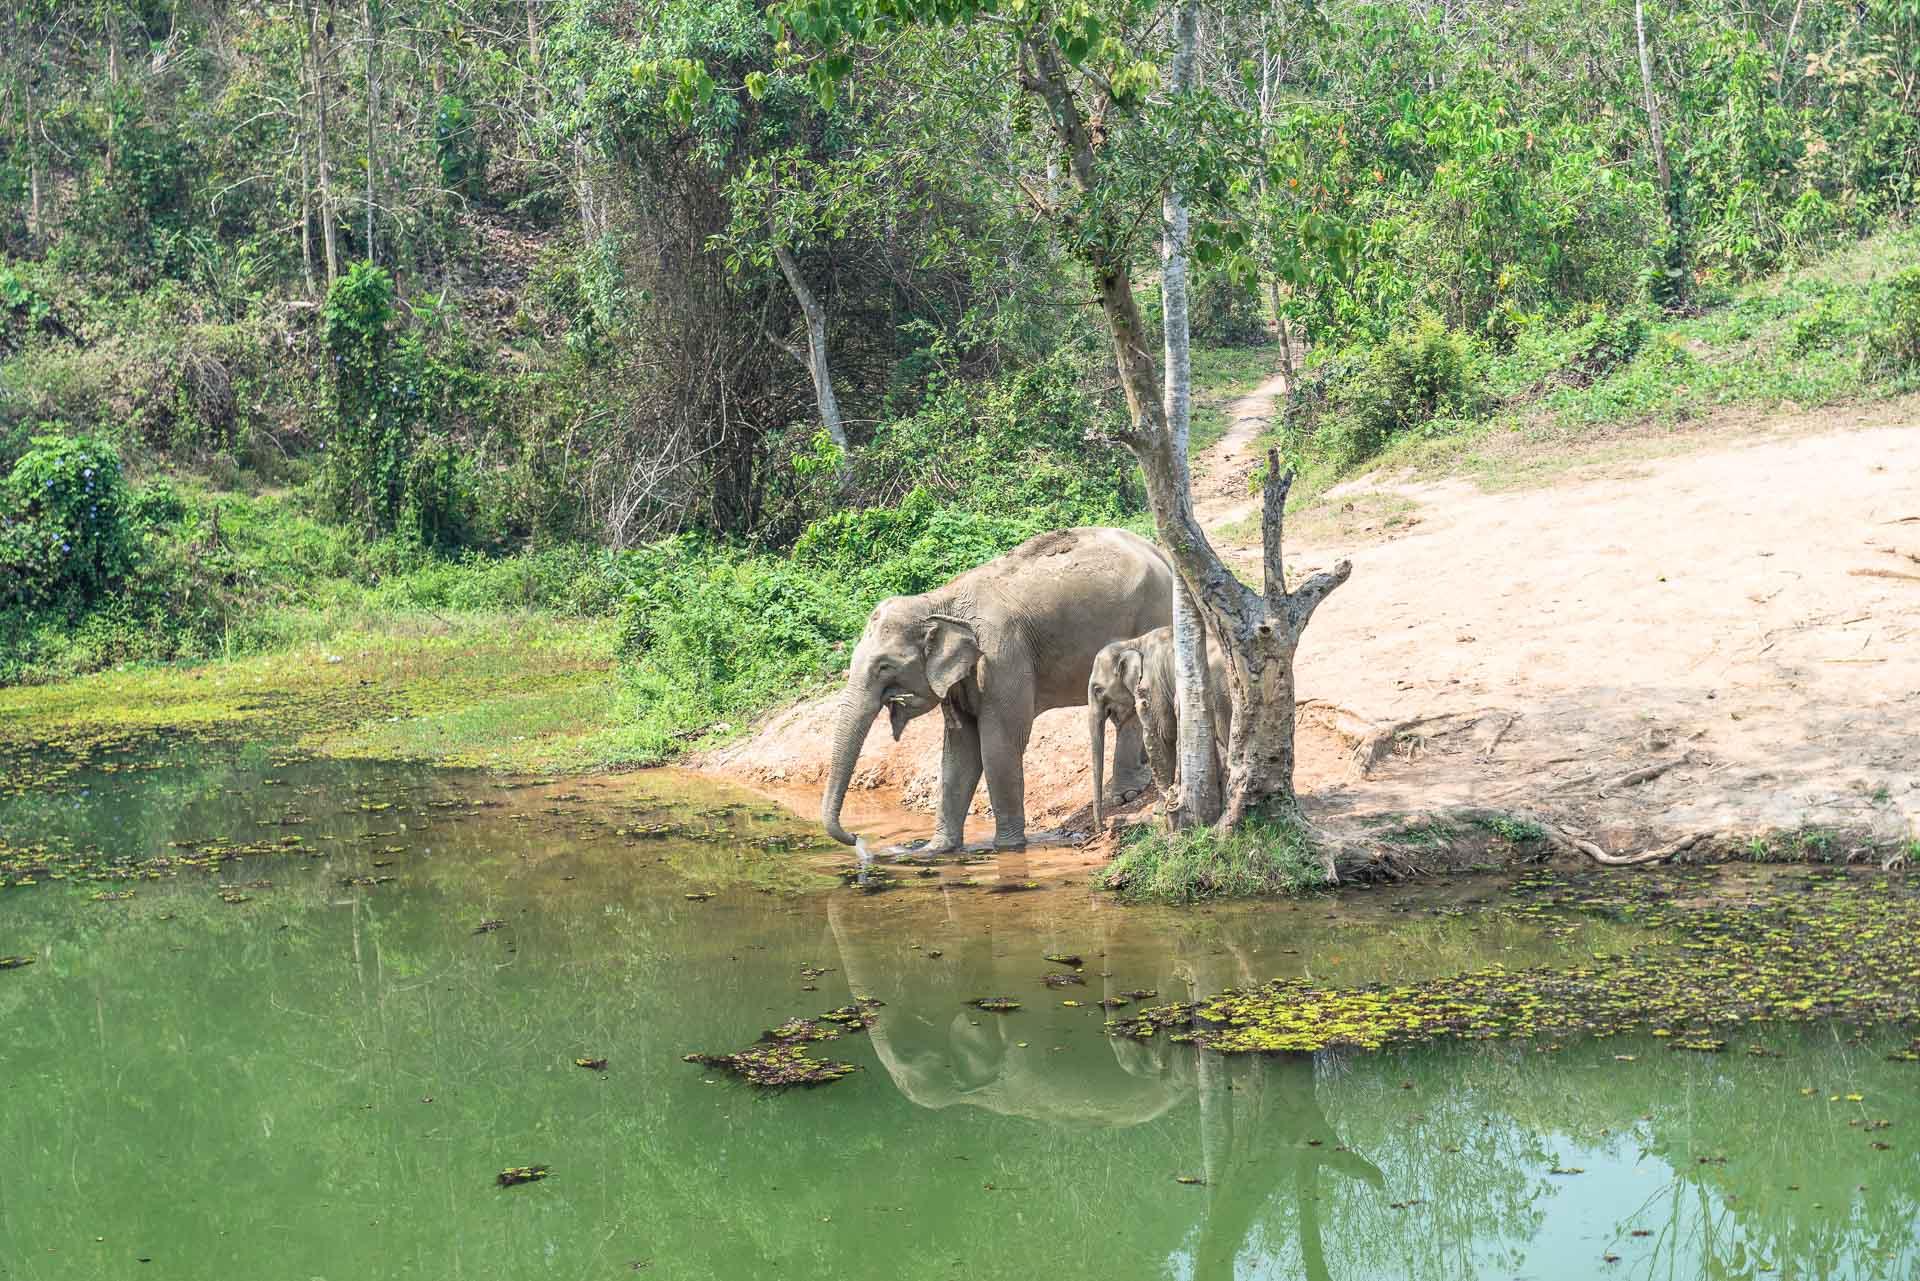 Lesvoyageuses-volontariat-centre-conservation-elephants-laos-9